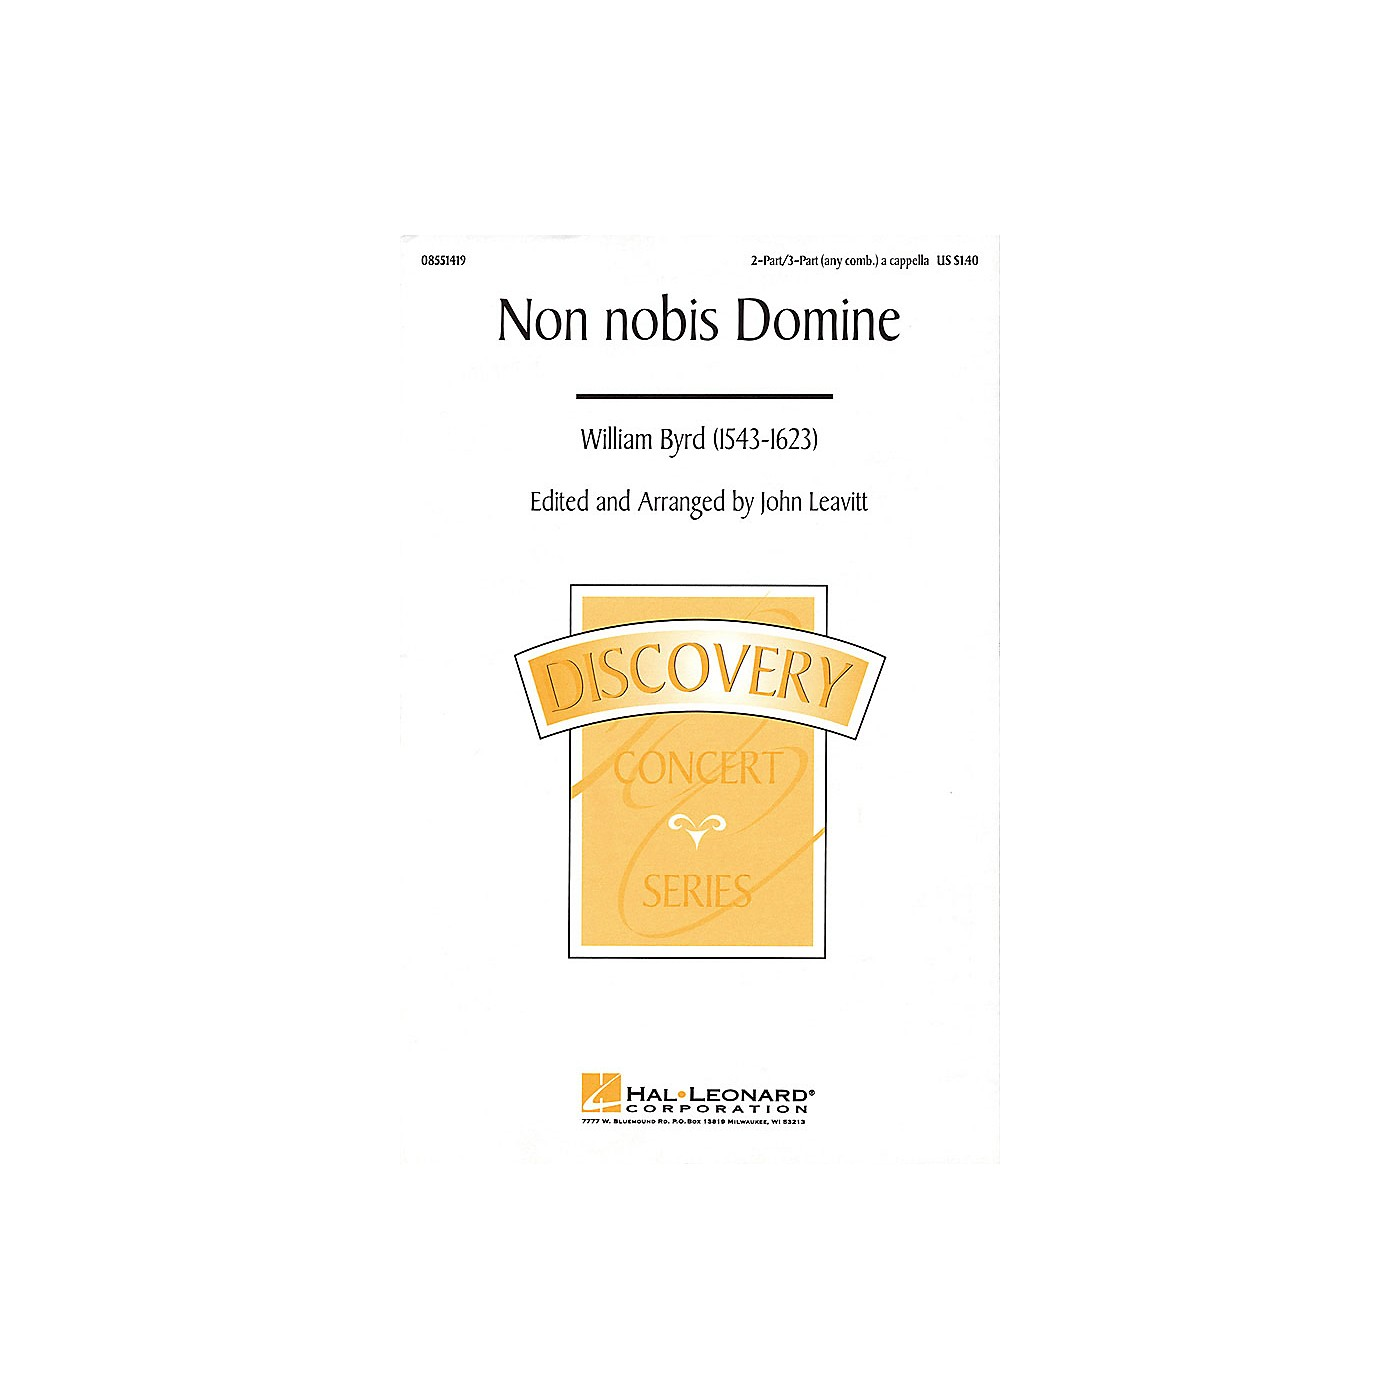 Hal Leonard Non Nobis Domine (2-Part/3-Part a cappella) 2 Part / 3 Part A Cappella arranged by John Leavitt thumbnail